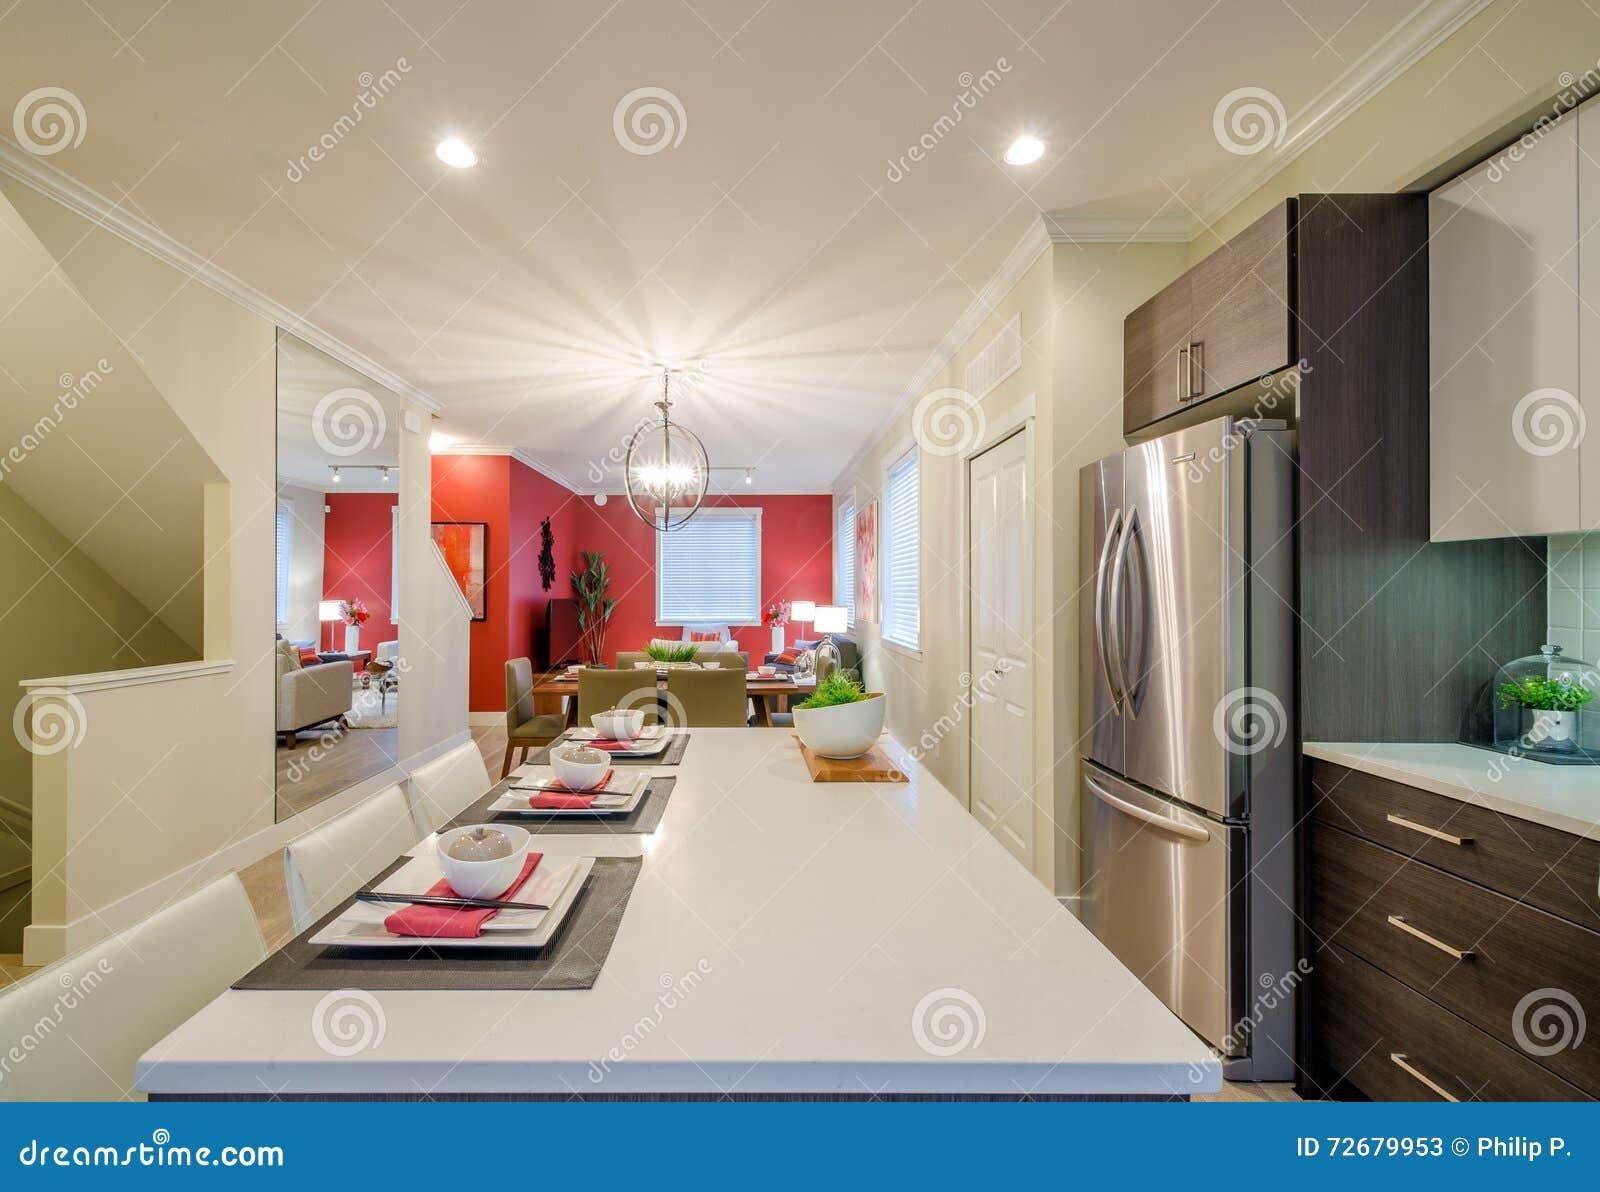 Cucina e sala da pranzo moderne immagine stock immagine 72679953 - Sala da pranzo moderne ...